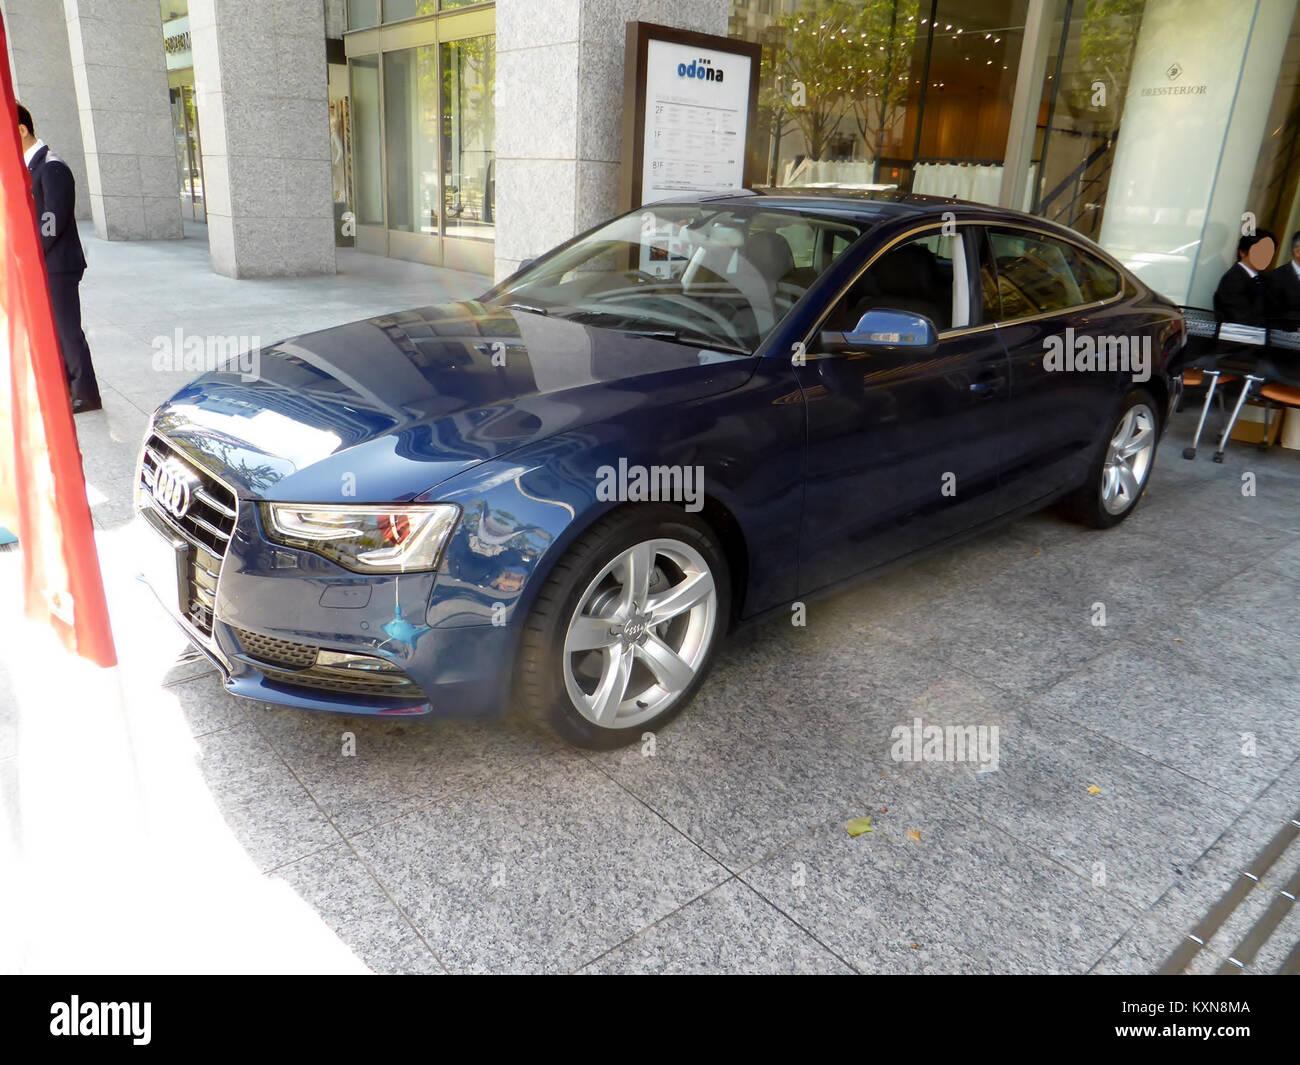 Audi A5 Sportback Stock Photos Amp Audi A5 Sportback Stock Images Alamy